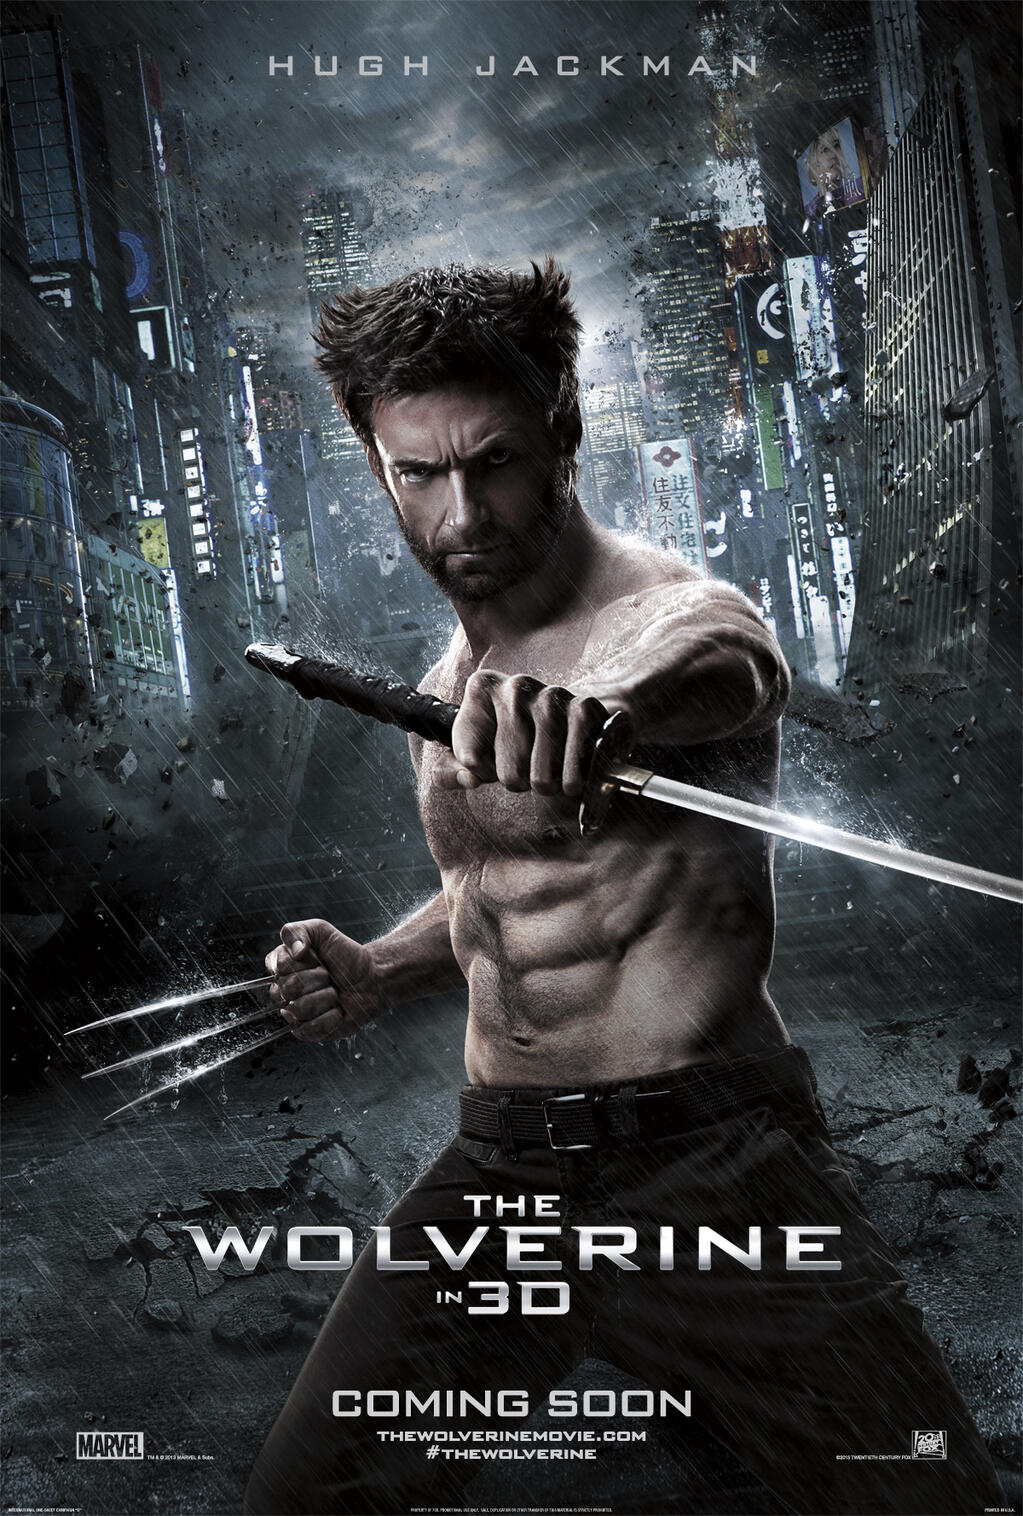 The Wolverine International Movie Poster 2 Domestic And International Trailers For The Wolverine Released